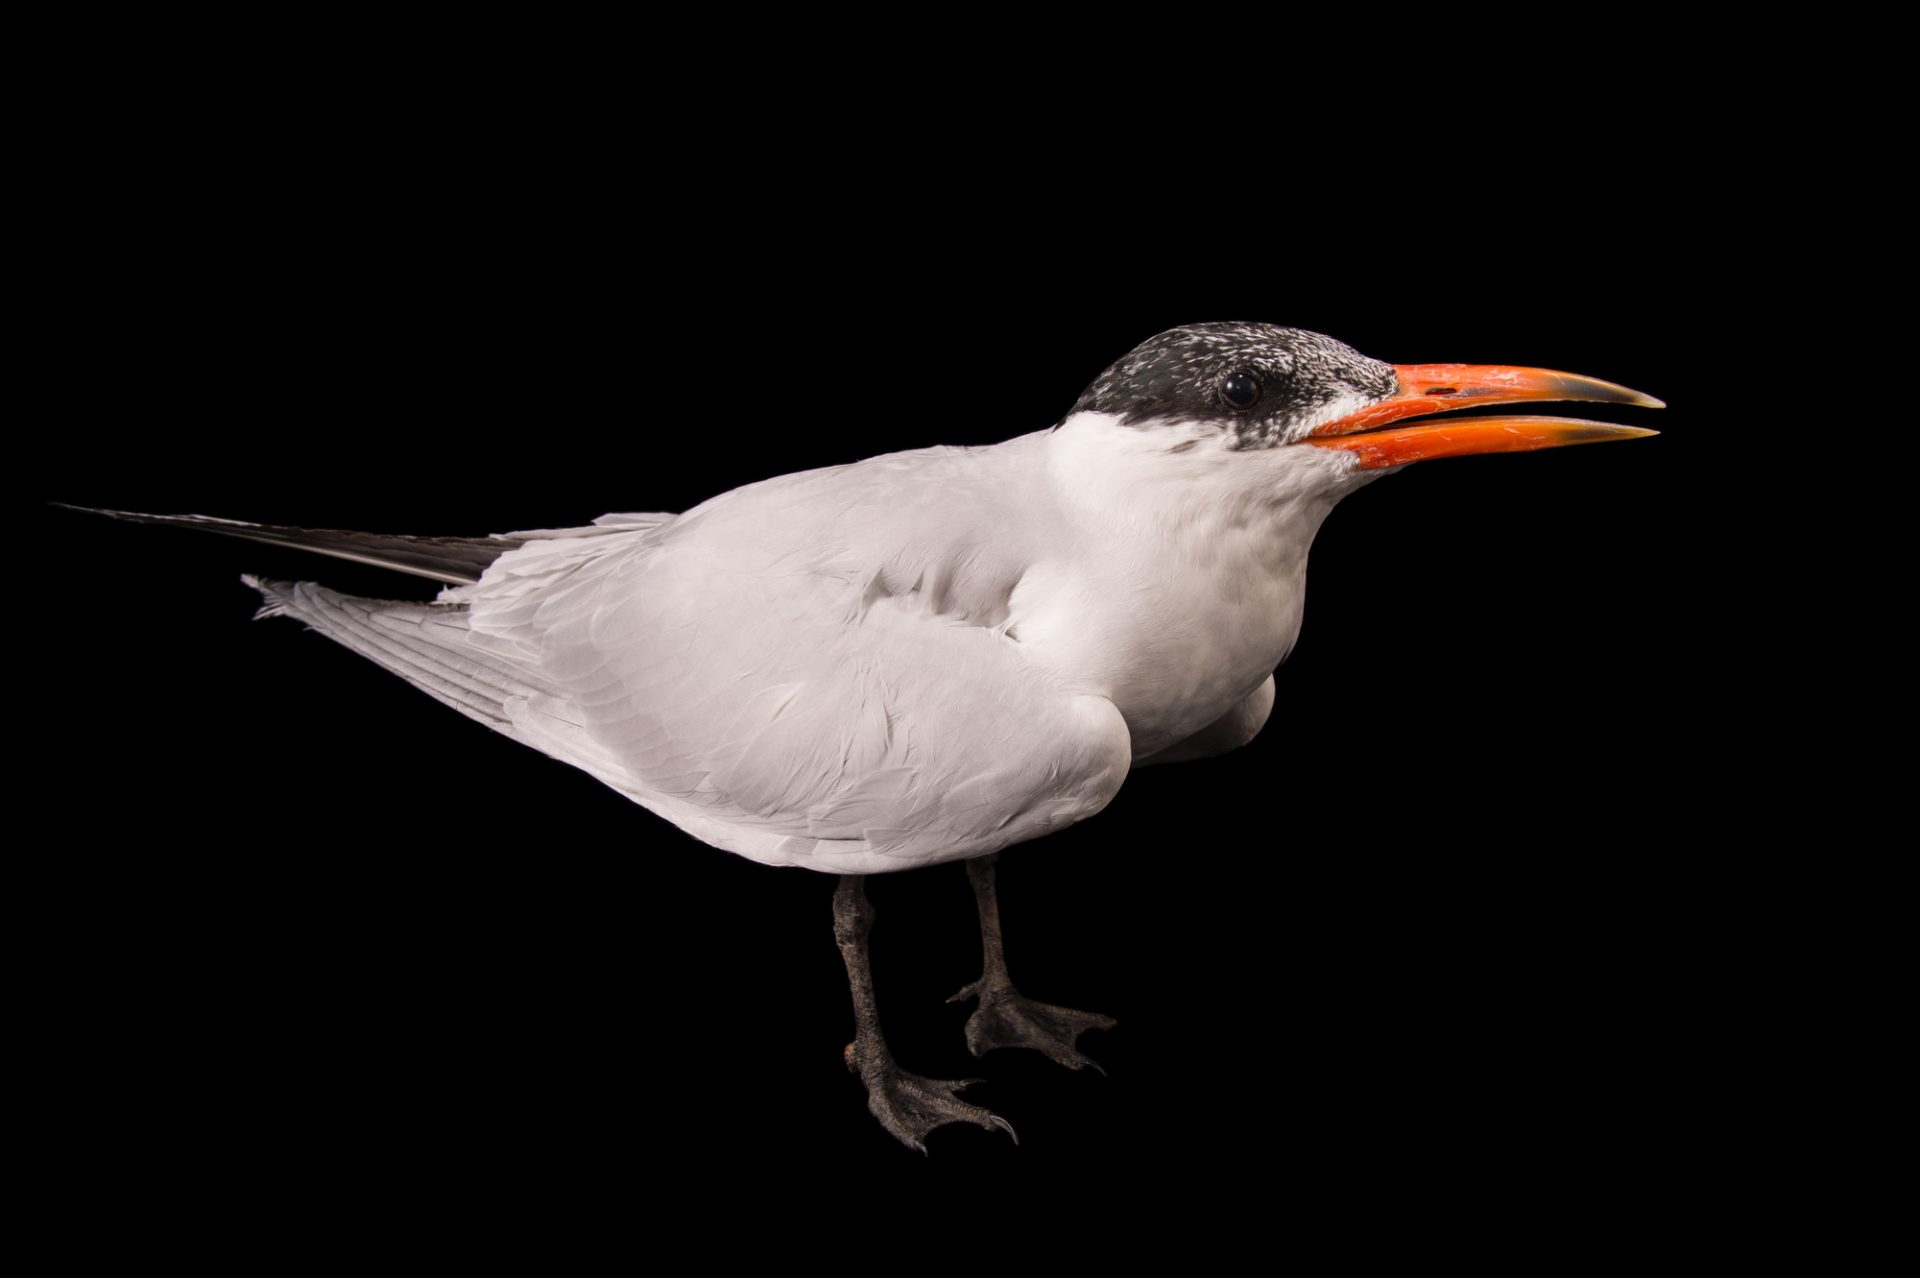 Picture of a Caspian tern (Hydroprogne caspia) at Tracy Aviary.